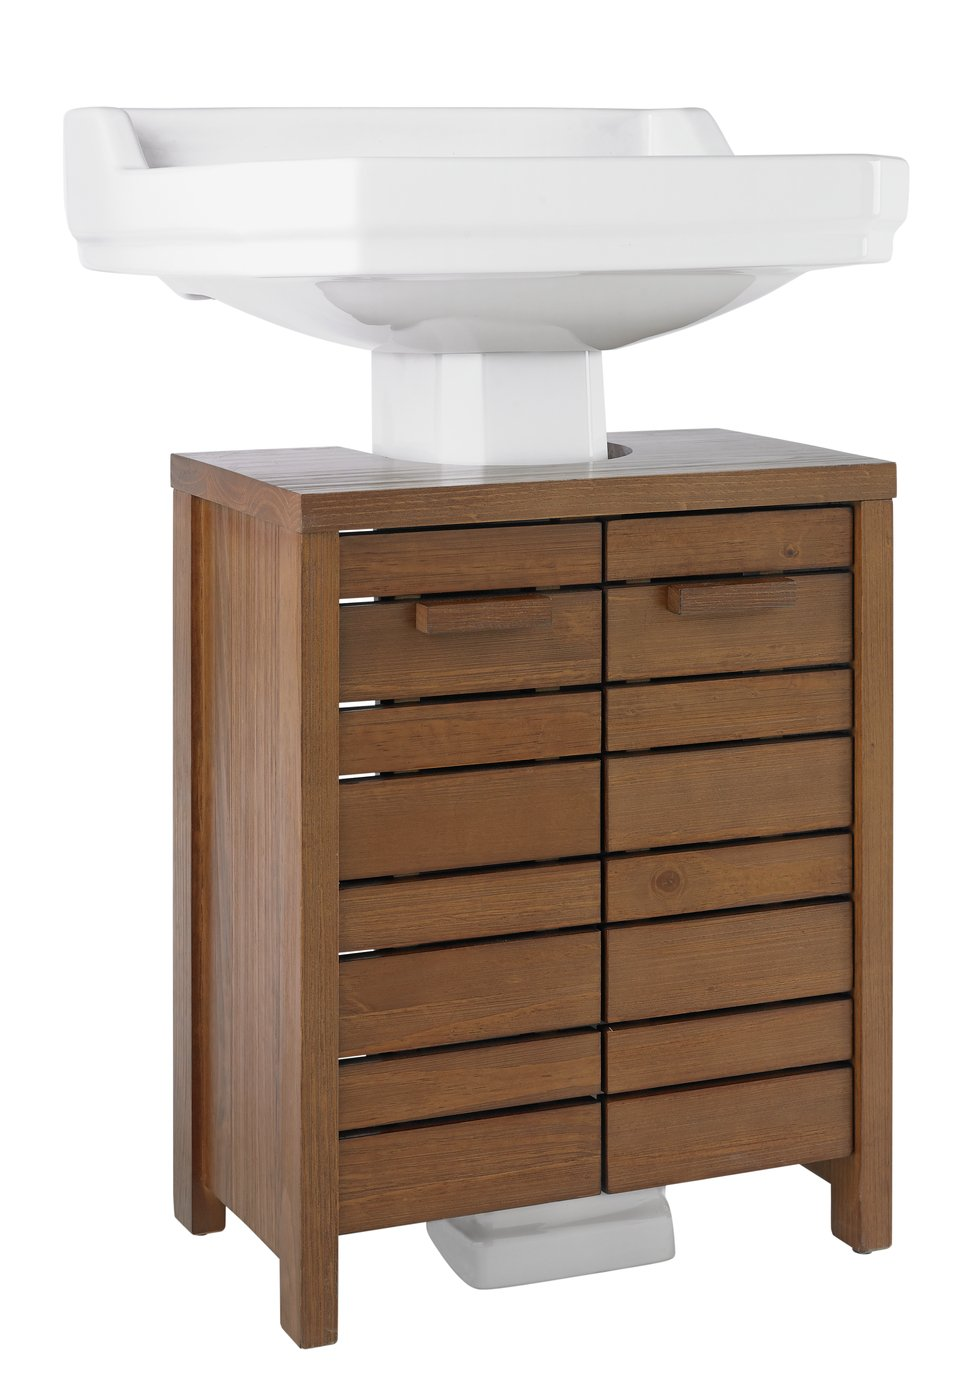 Awesome Bathroom Furniture Bathroom Cabinets Garden Bathroom Bathrooms Forward